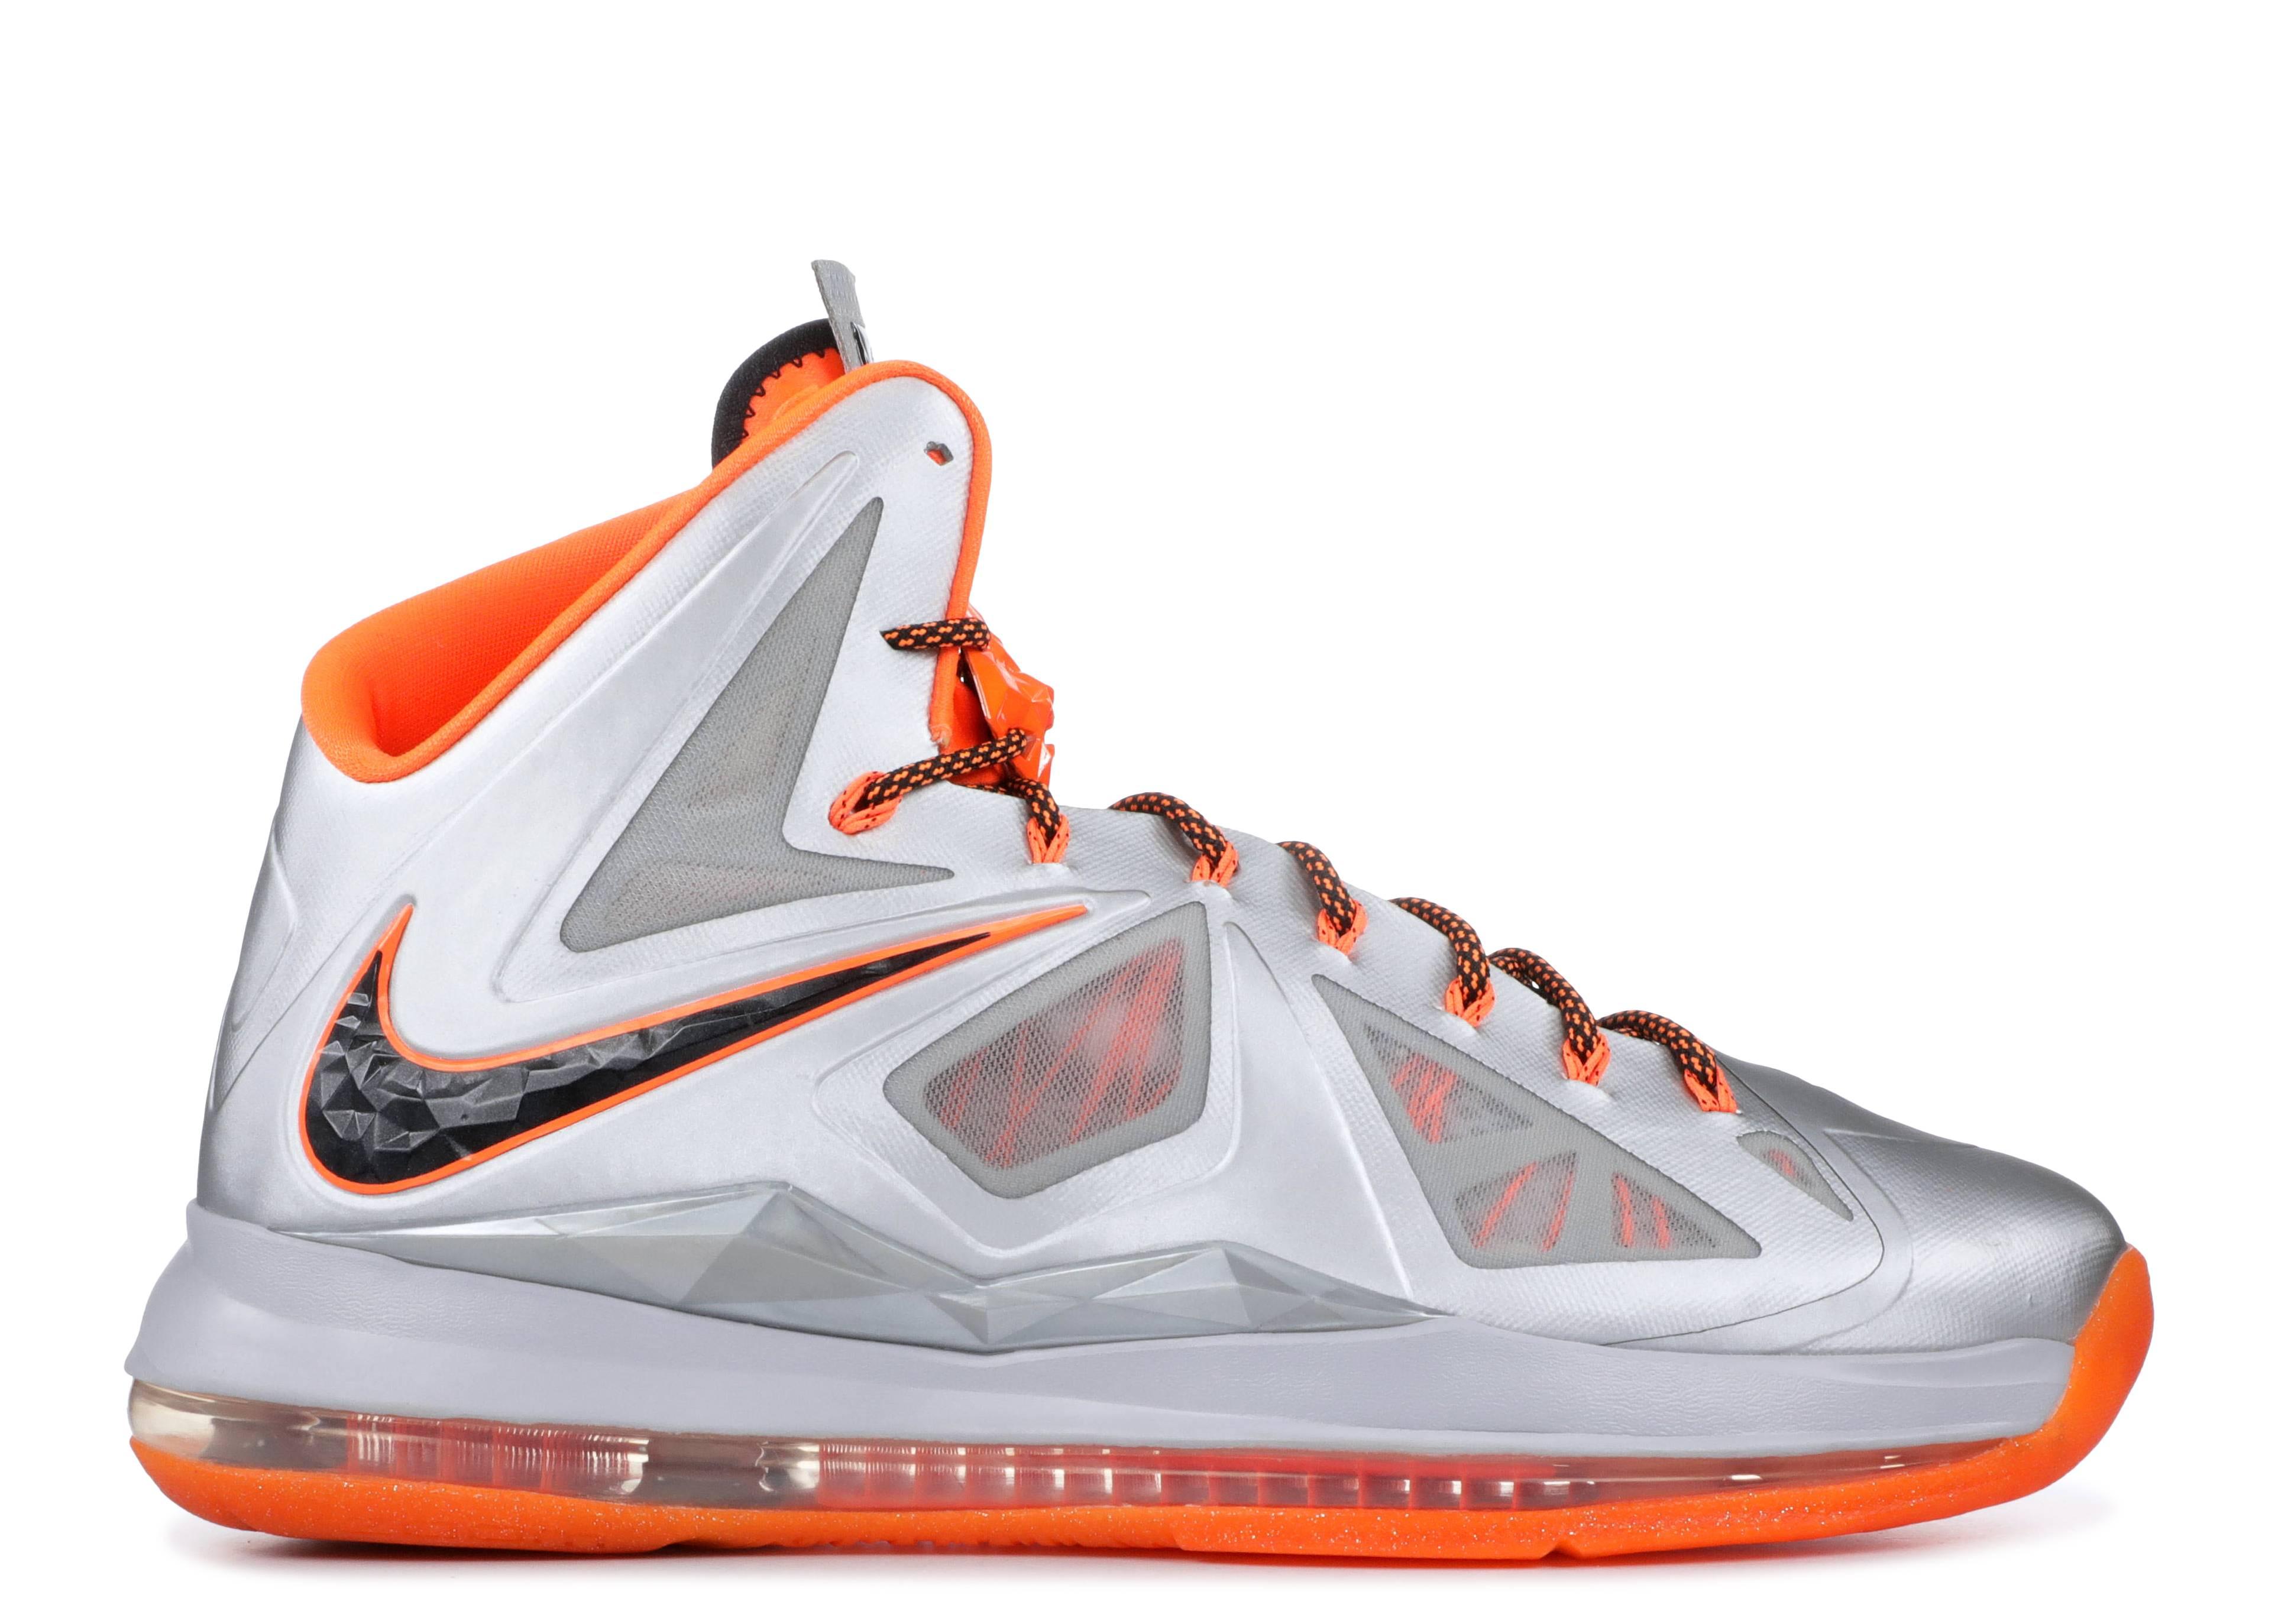 ce4dae44b86 Nike Lebron X Diana Taurasi Pe - Nike - mnbskt232399969y3 - mercury ...